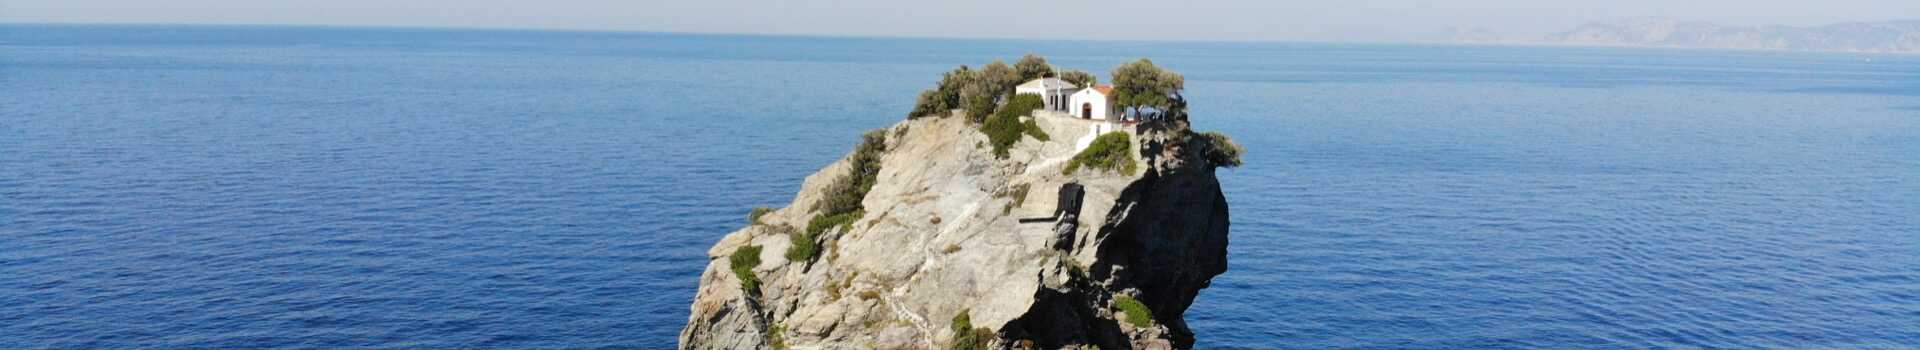 Řecko, Skopelos, Agios Ioannis1